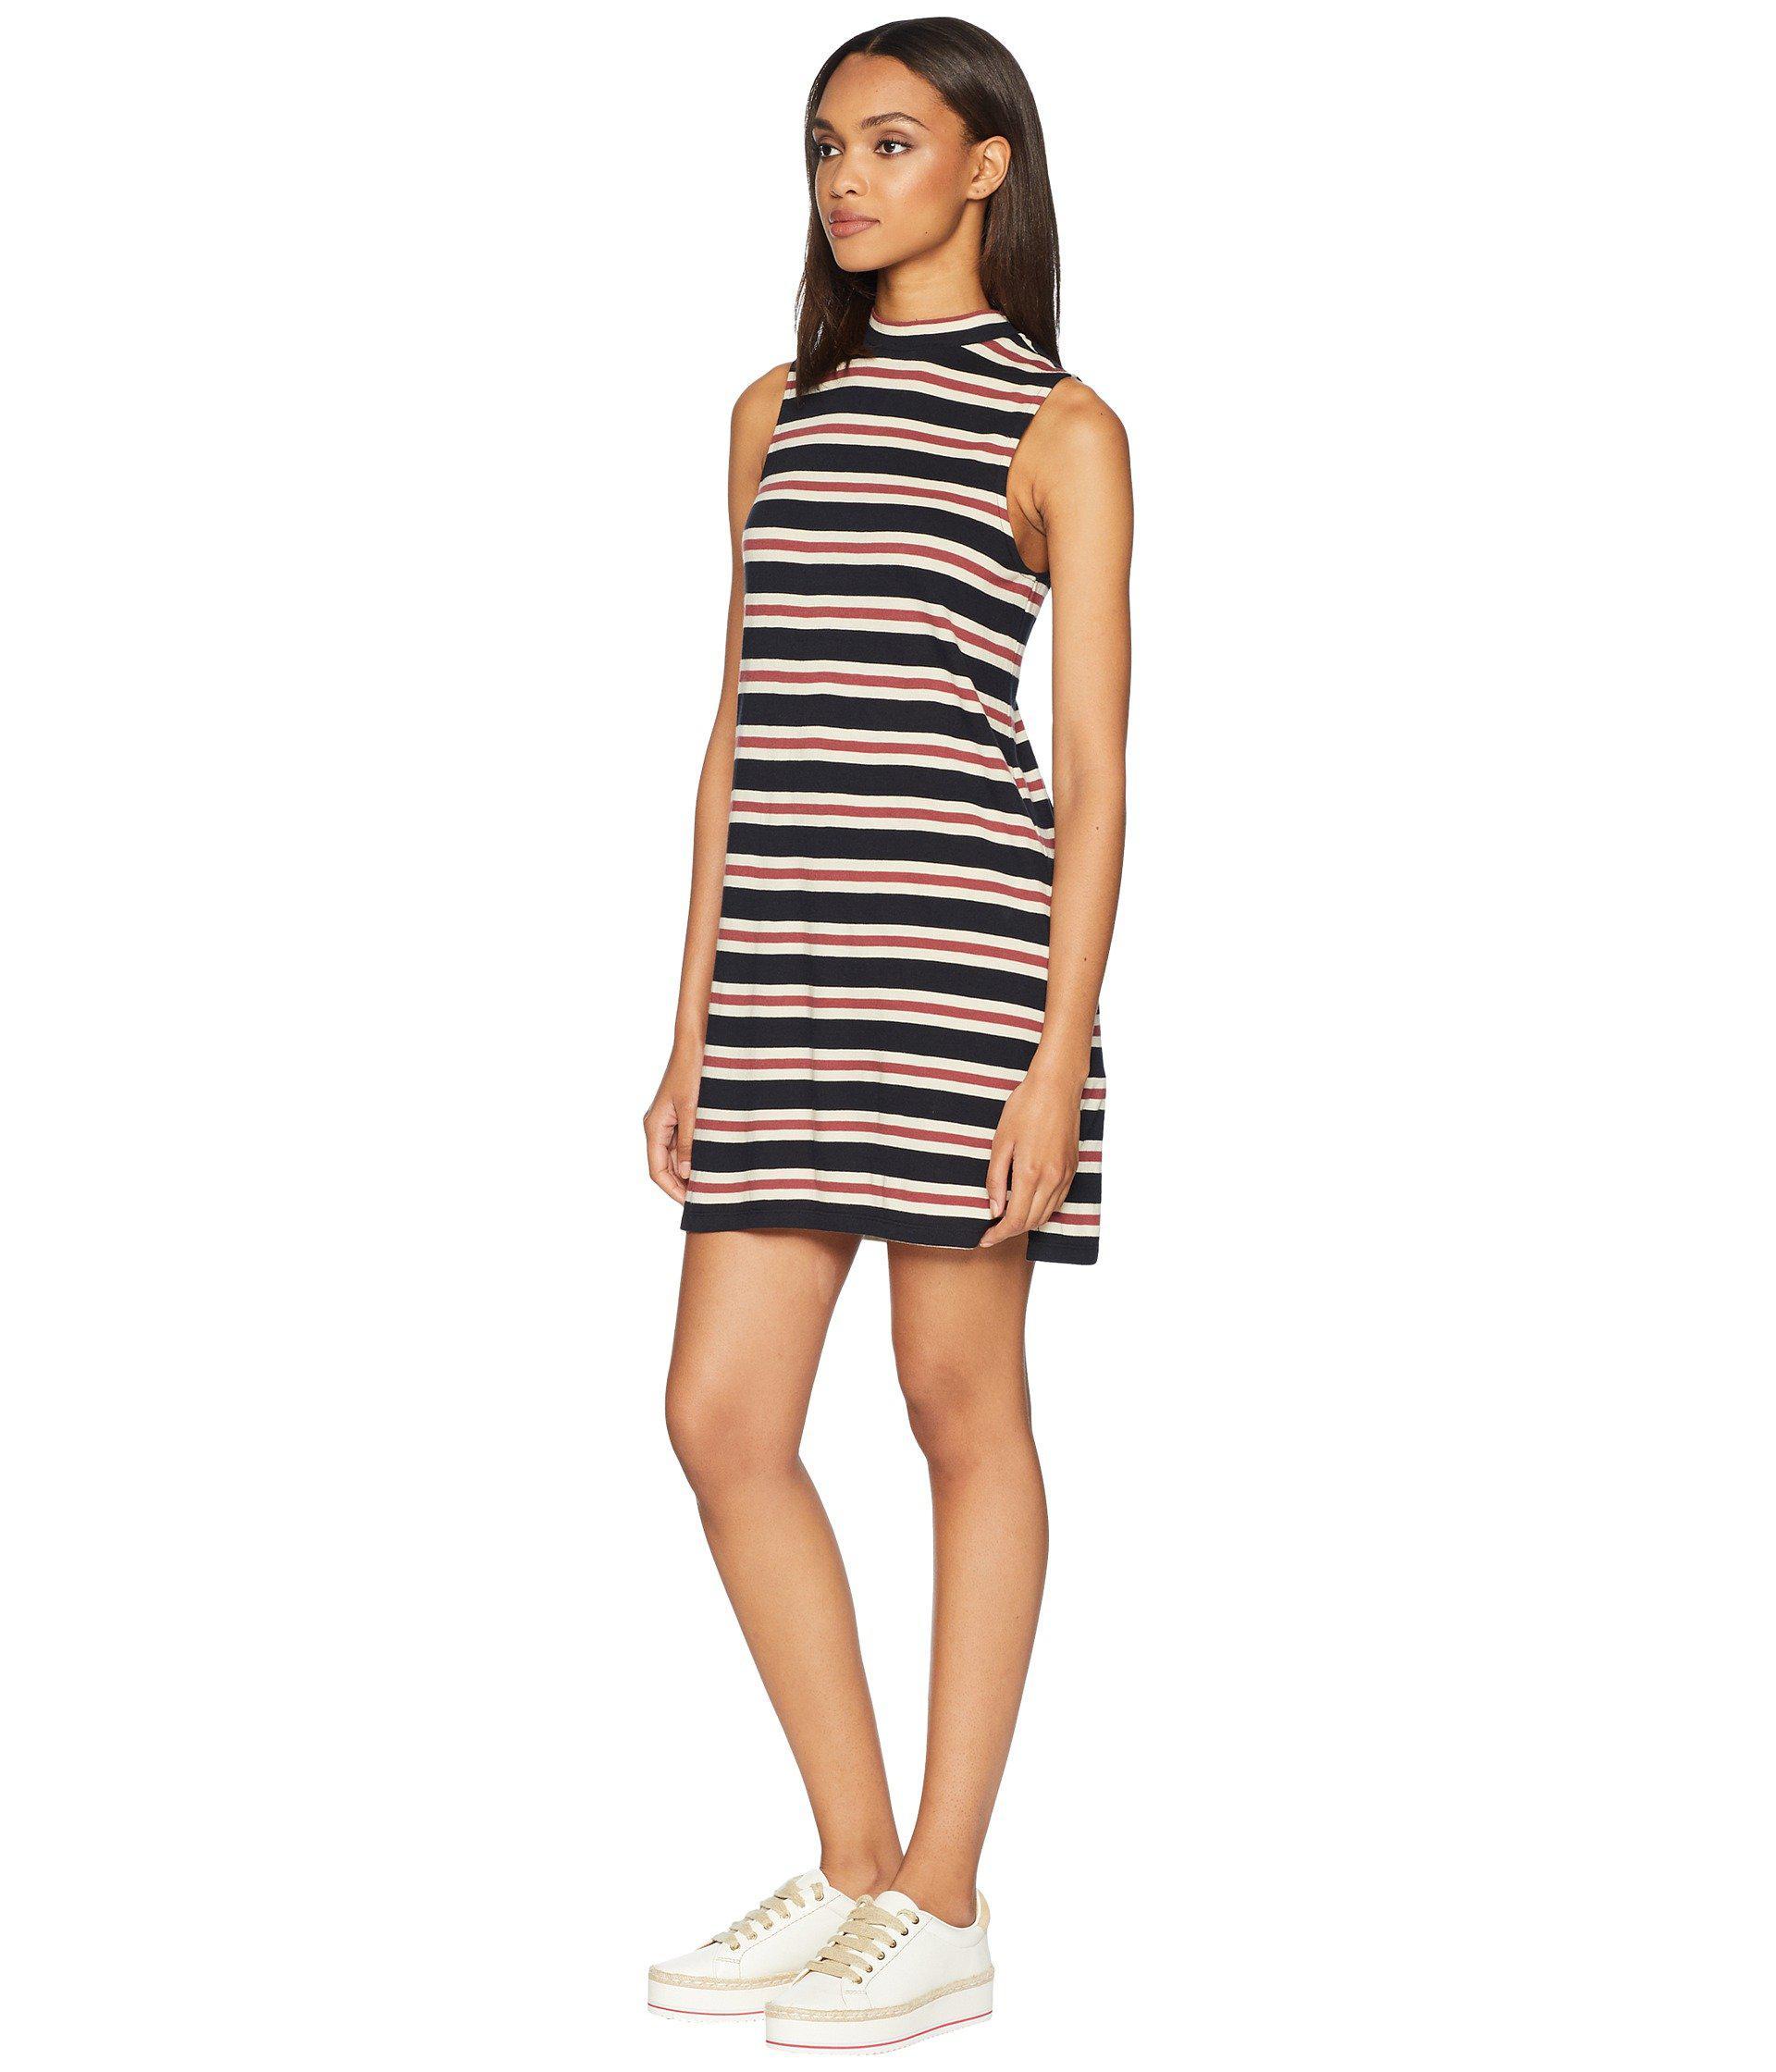 46edbf9f2b Lyst - Billabong High Hopes Dress in Black - Save 44%